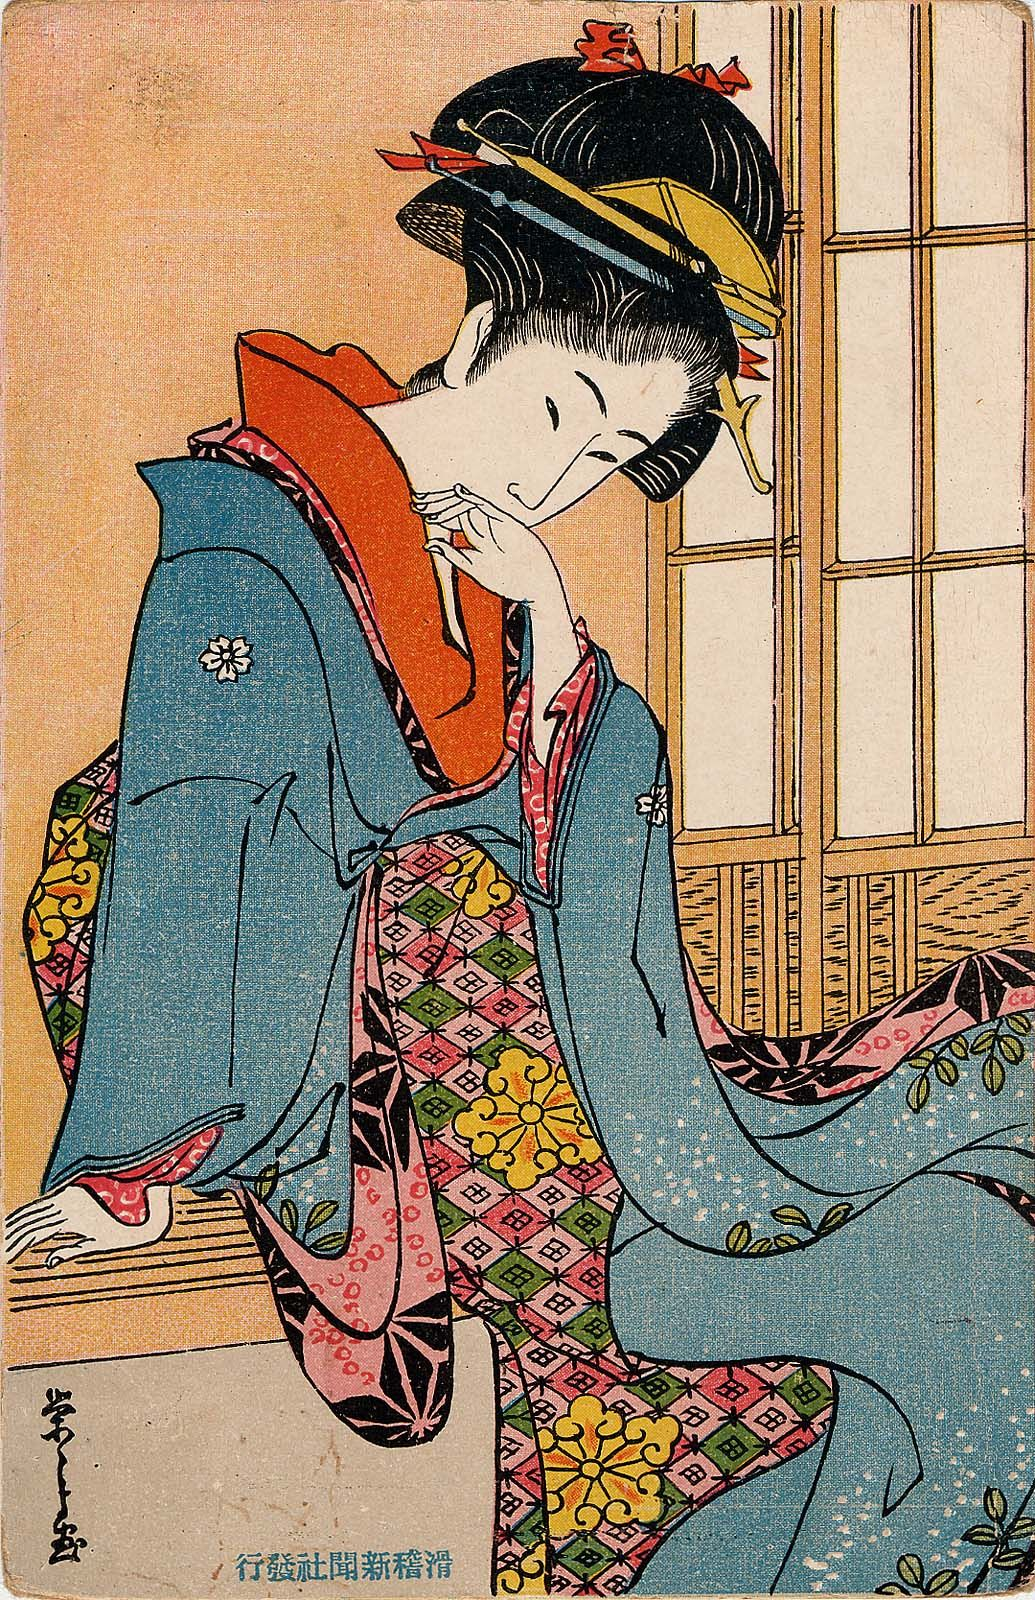 Woman In Ukiyo E Style Sitting By Shoji Doors From Osaka Kokkei Shinbun Japanese Art Japanese Artwork Japanese Woodblock Printing